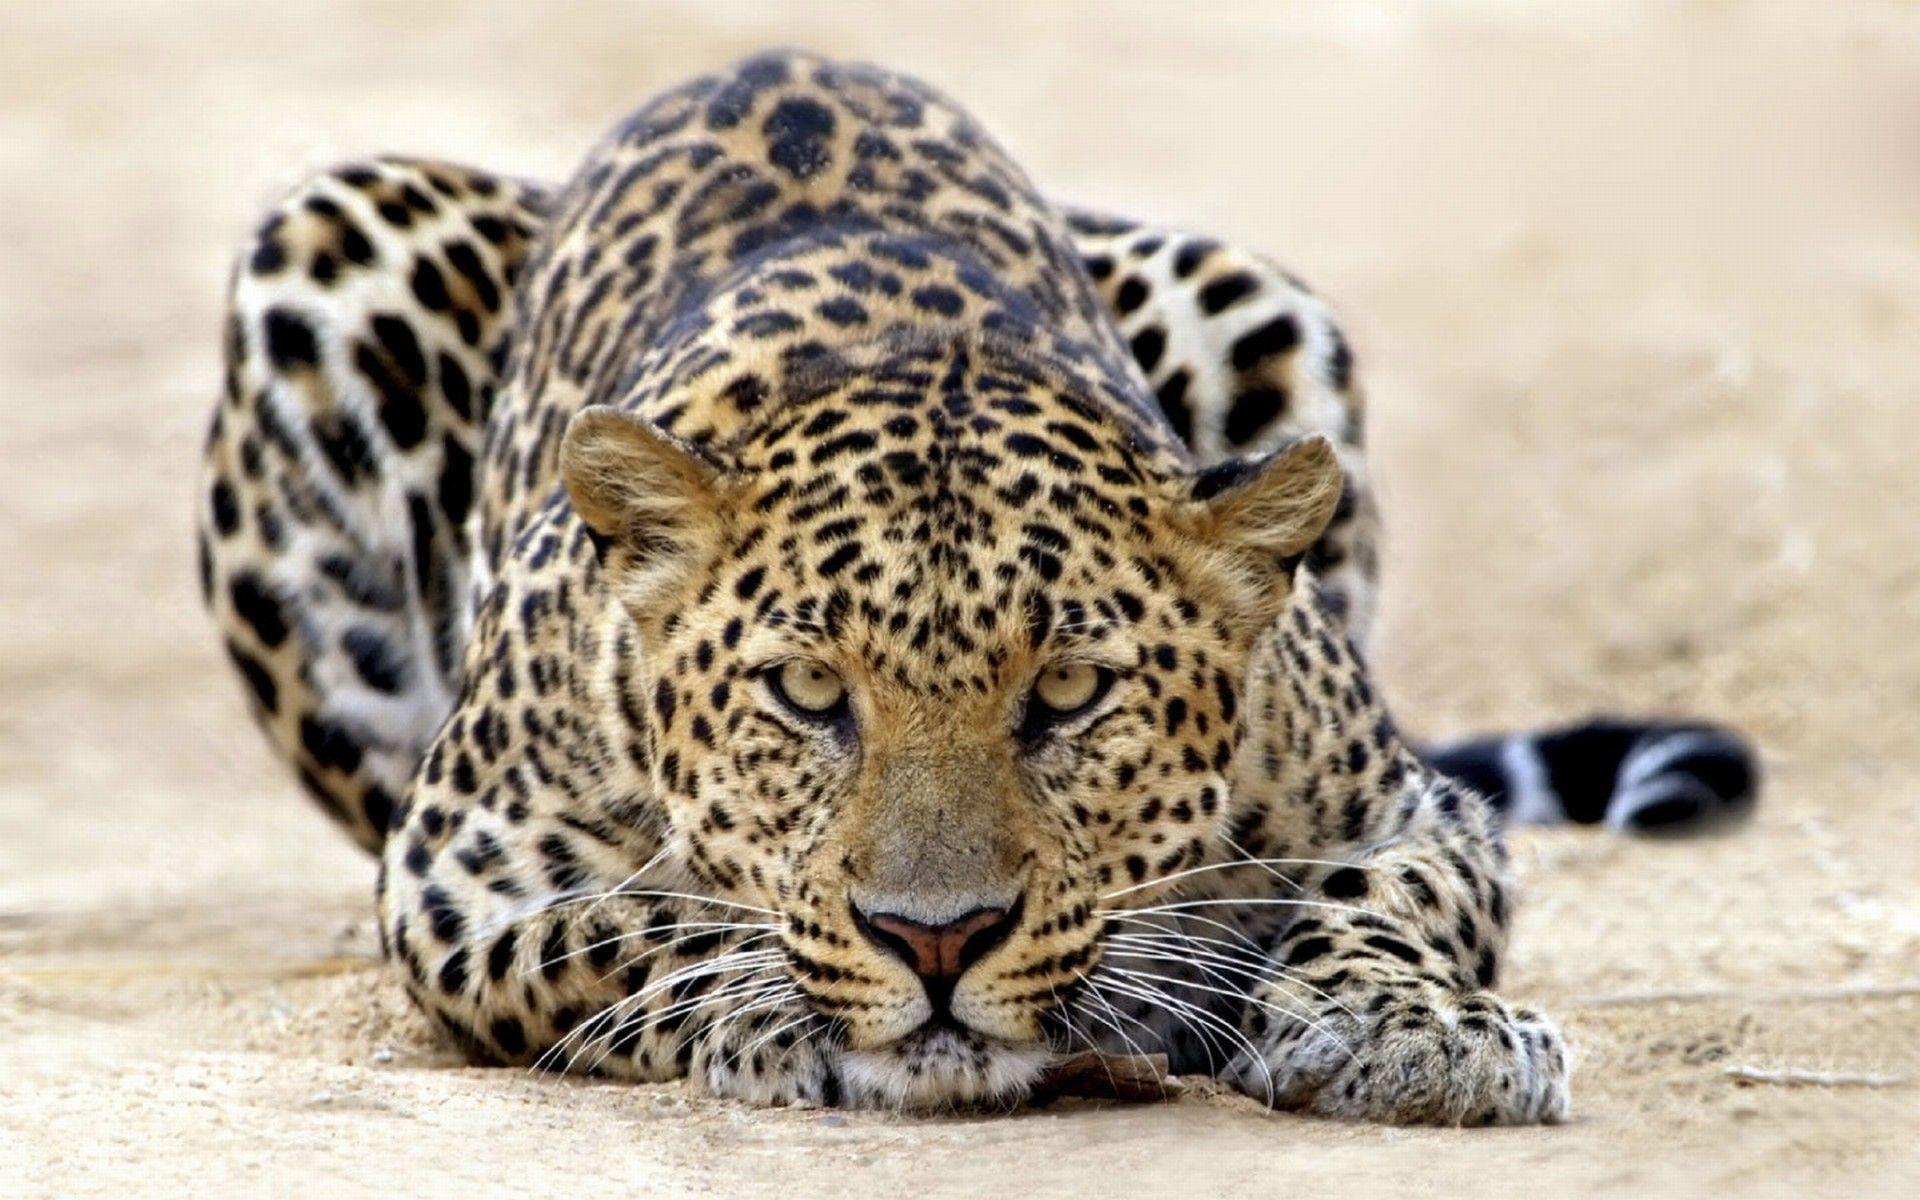 Animals Photography Leopards 1920x1200 Wallpaper Animals Cat